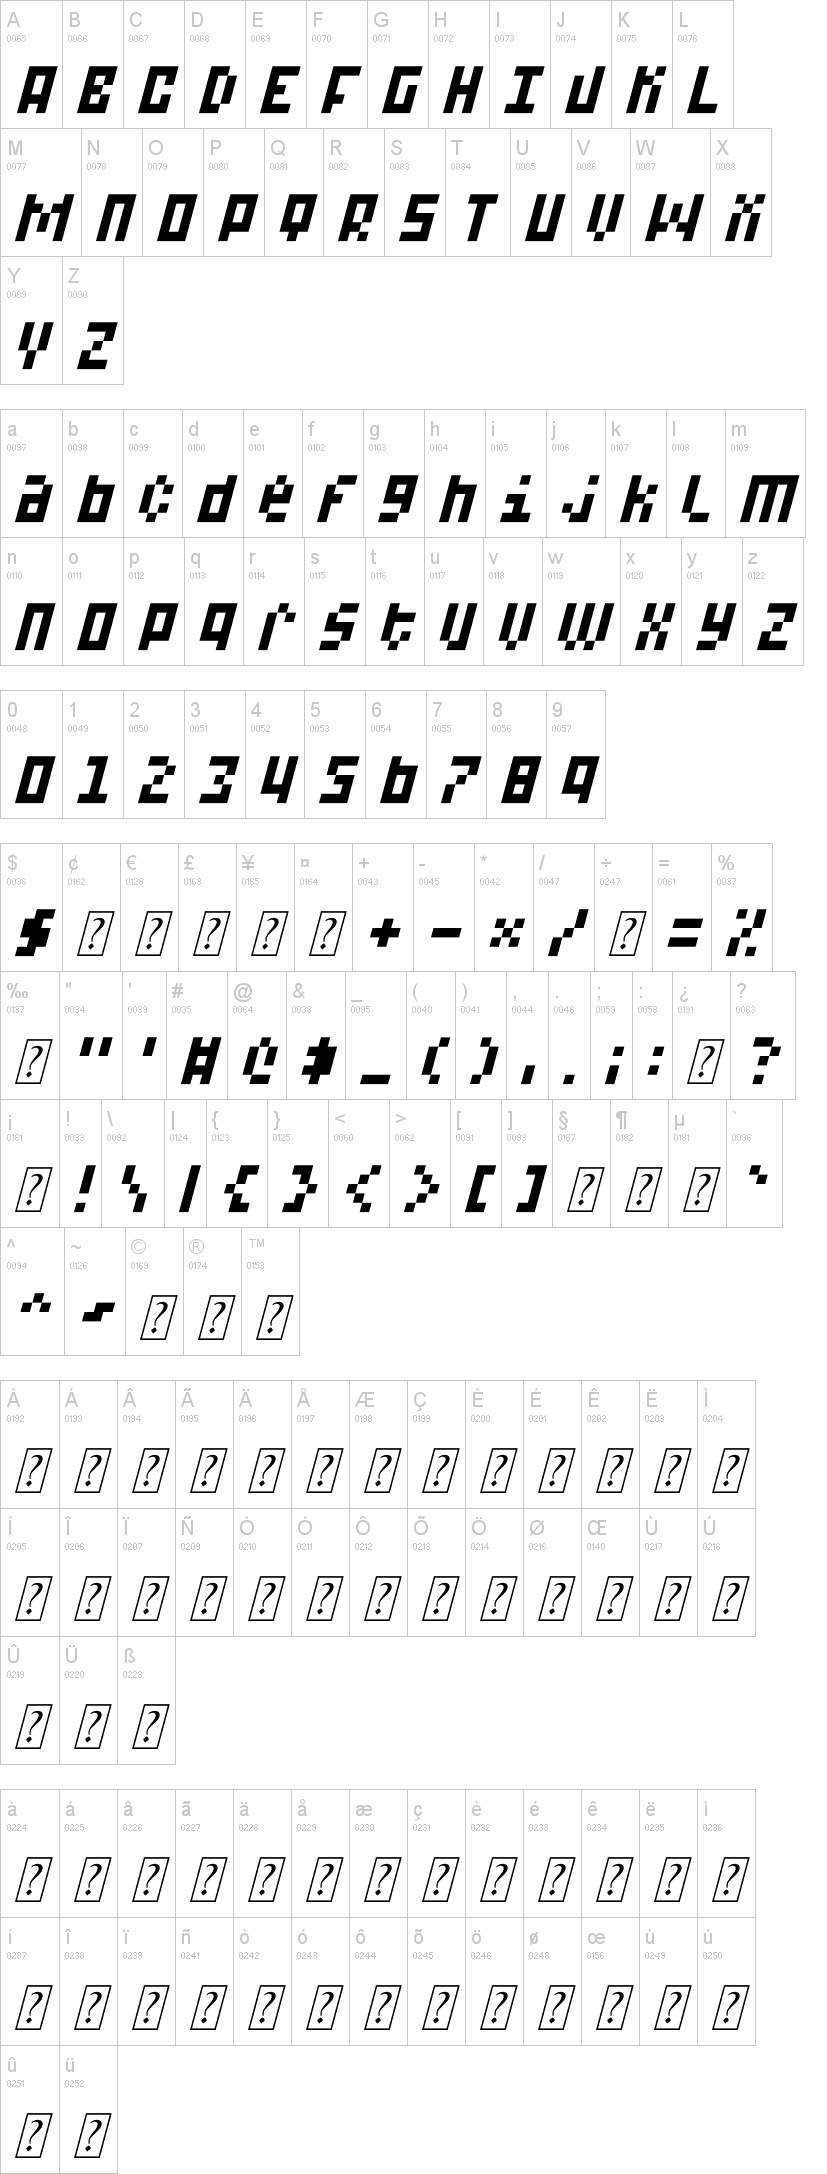 a_15_bit0